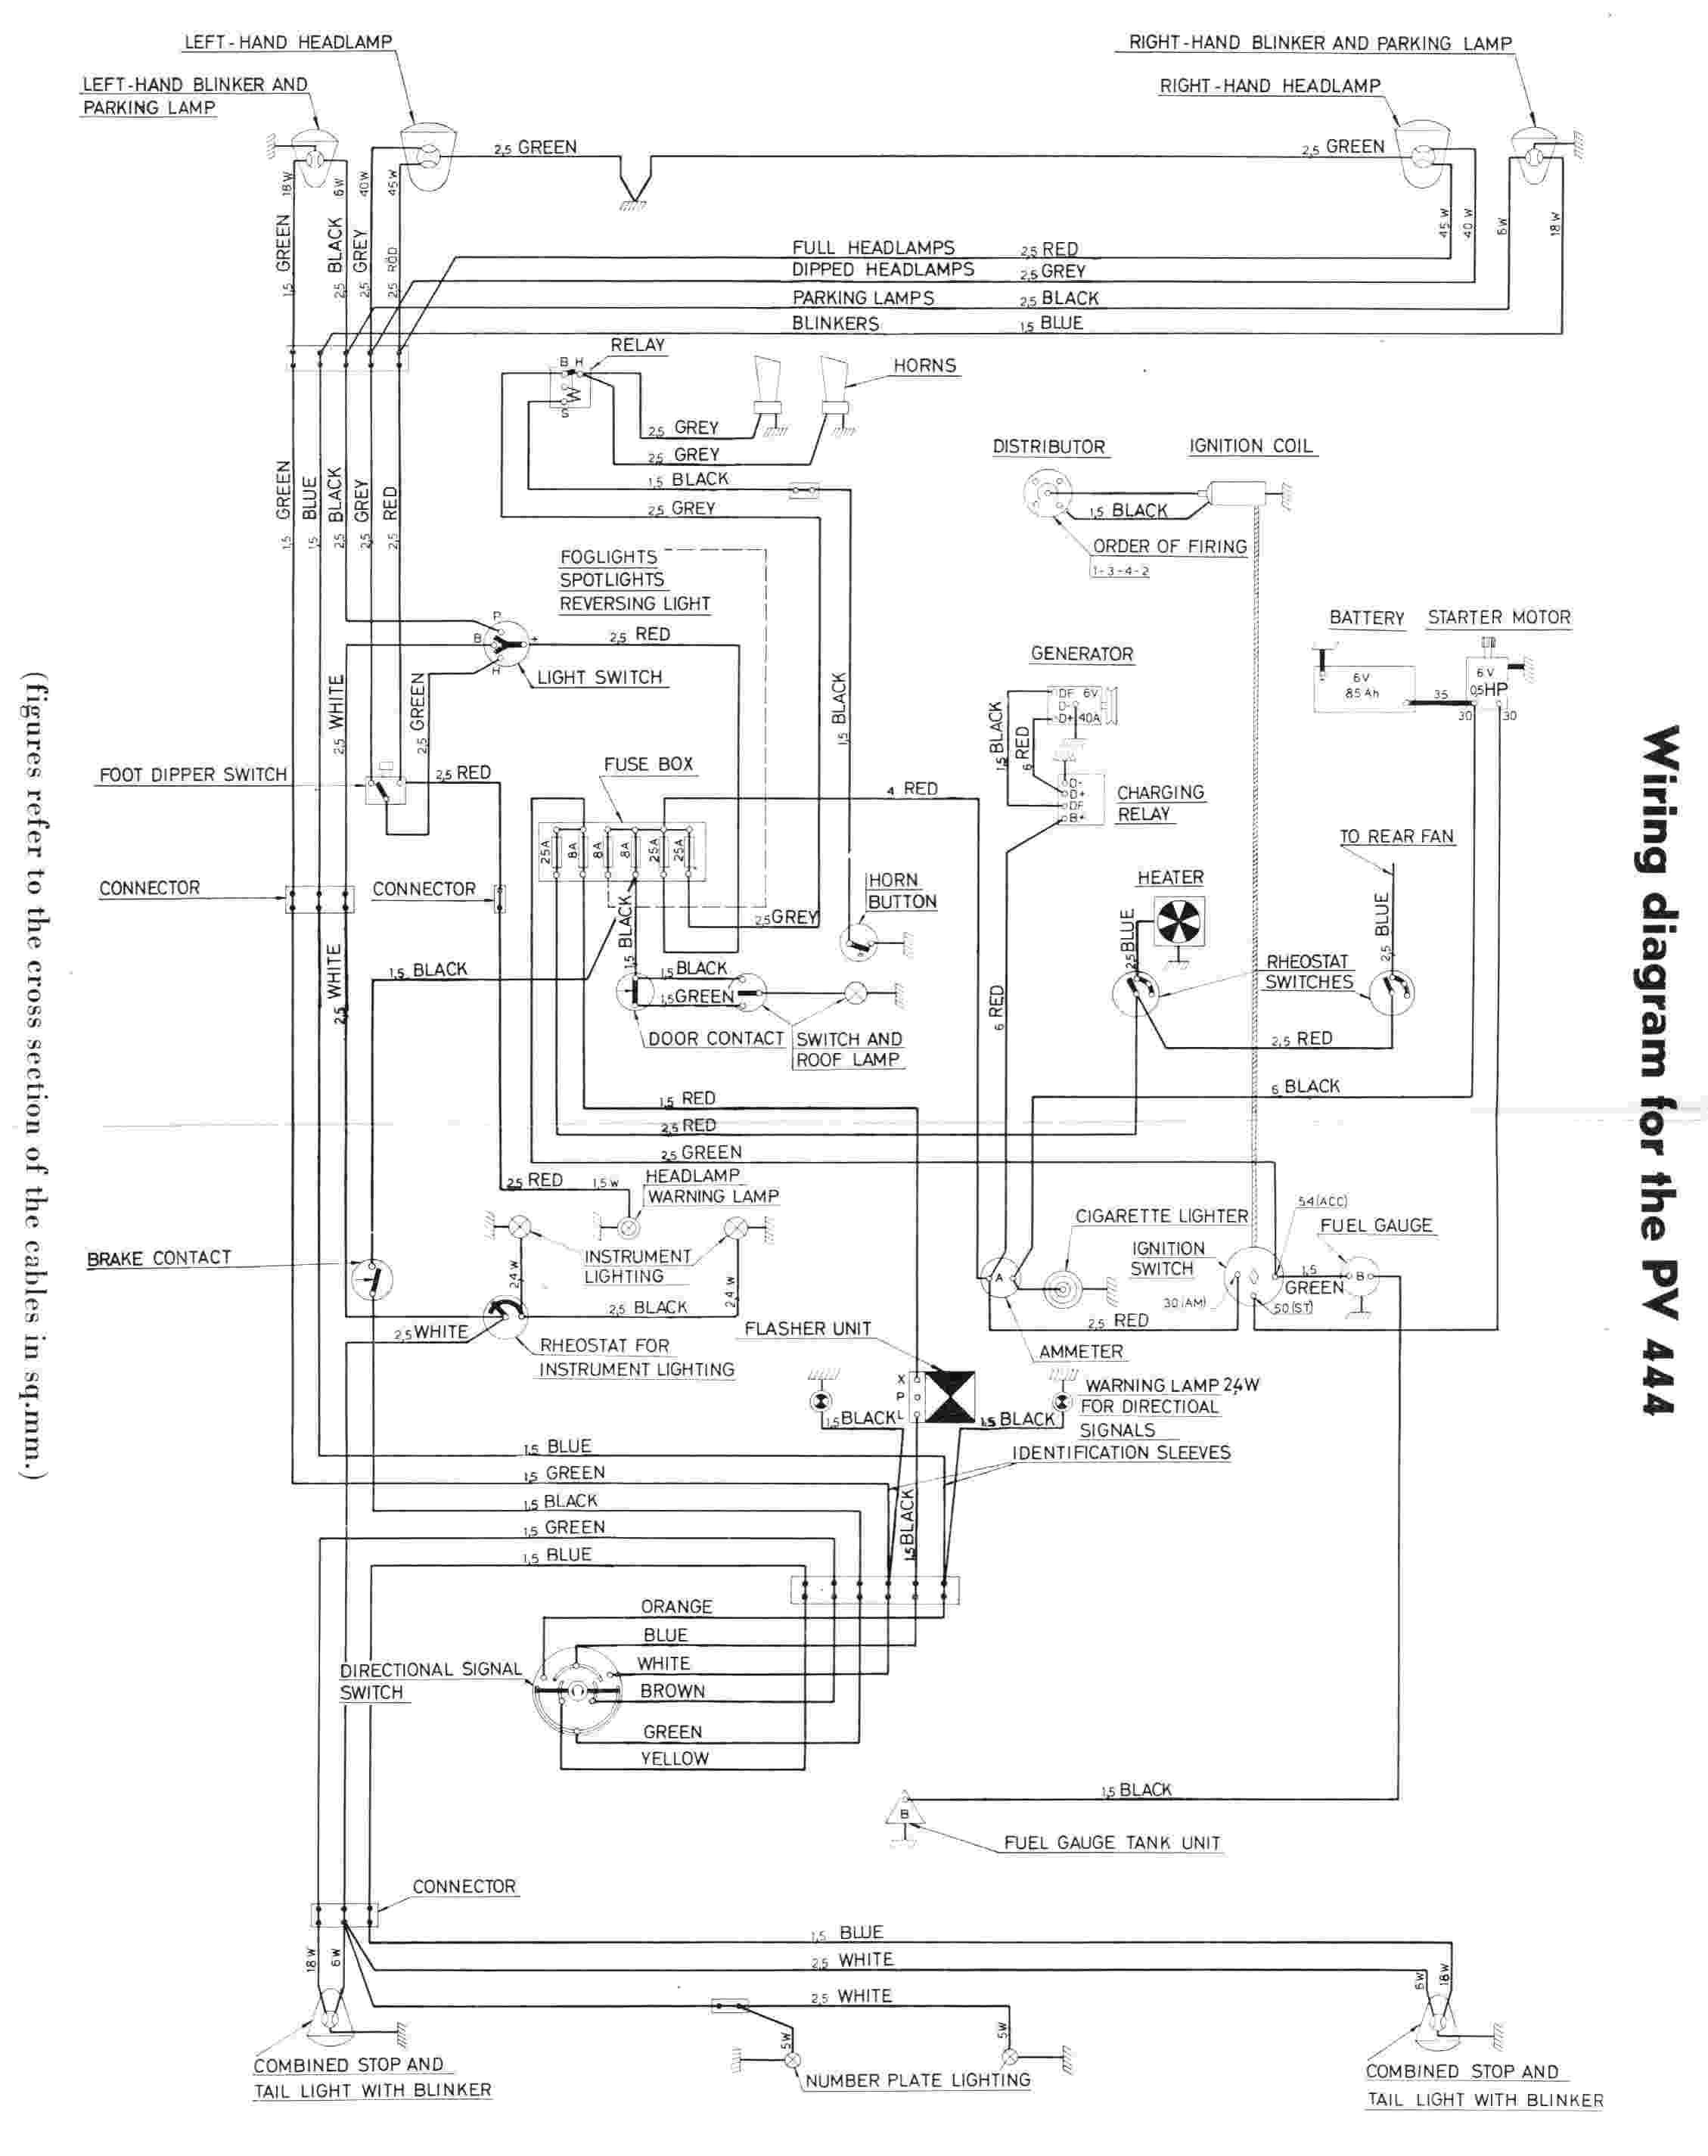 hight resolution of volvo 360 wiring diagram online wiring diagramvn alternator wiring diagram wiring diagrams volvo 360 wiring diagram